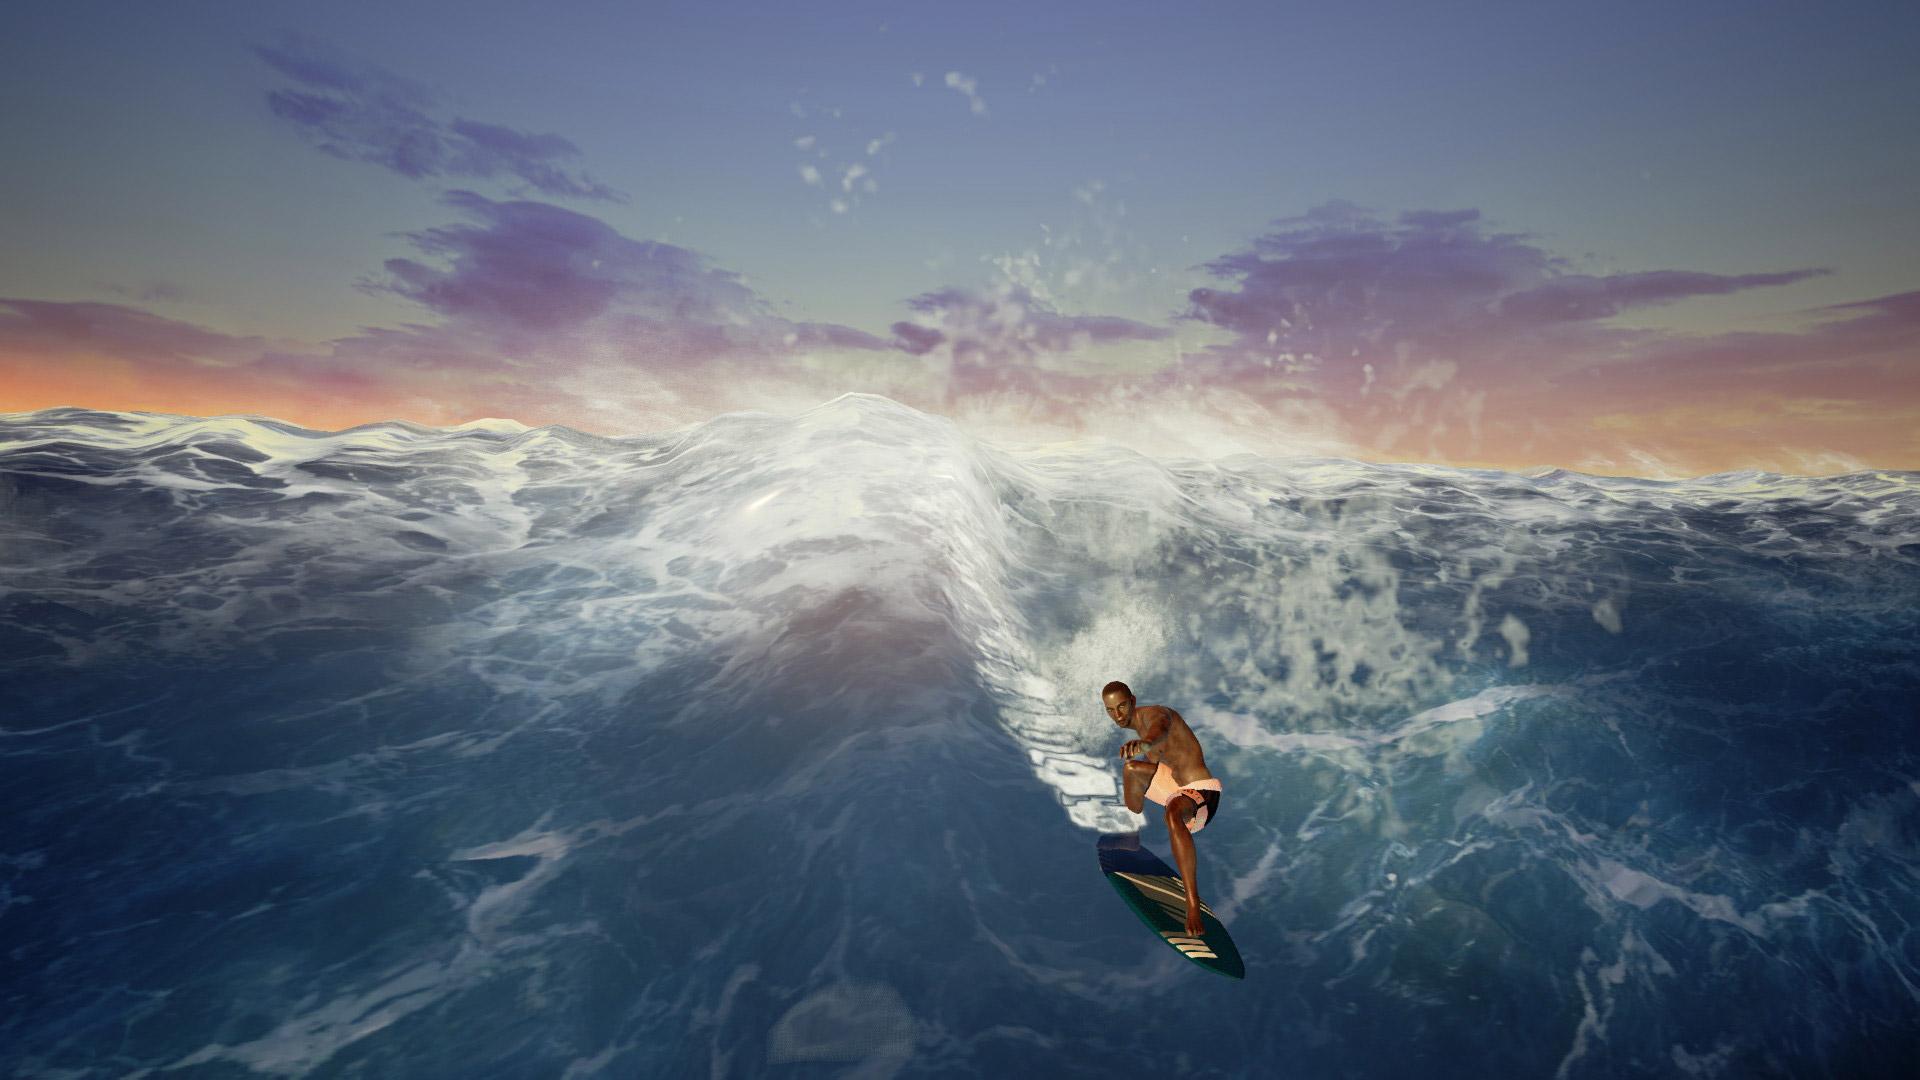 Free Surf World Series Wallpaper in 1920x1080